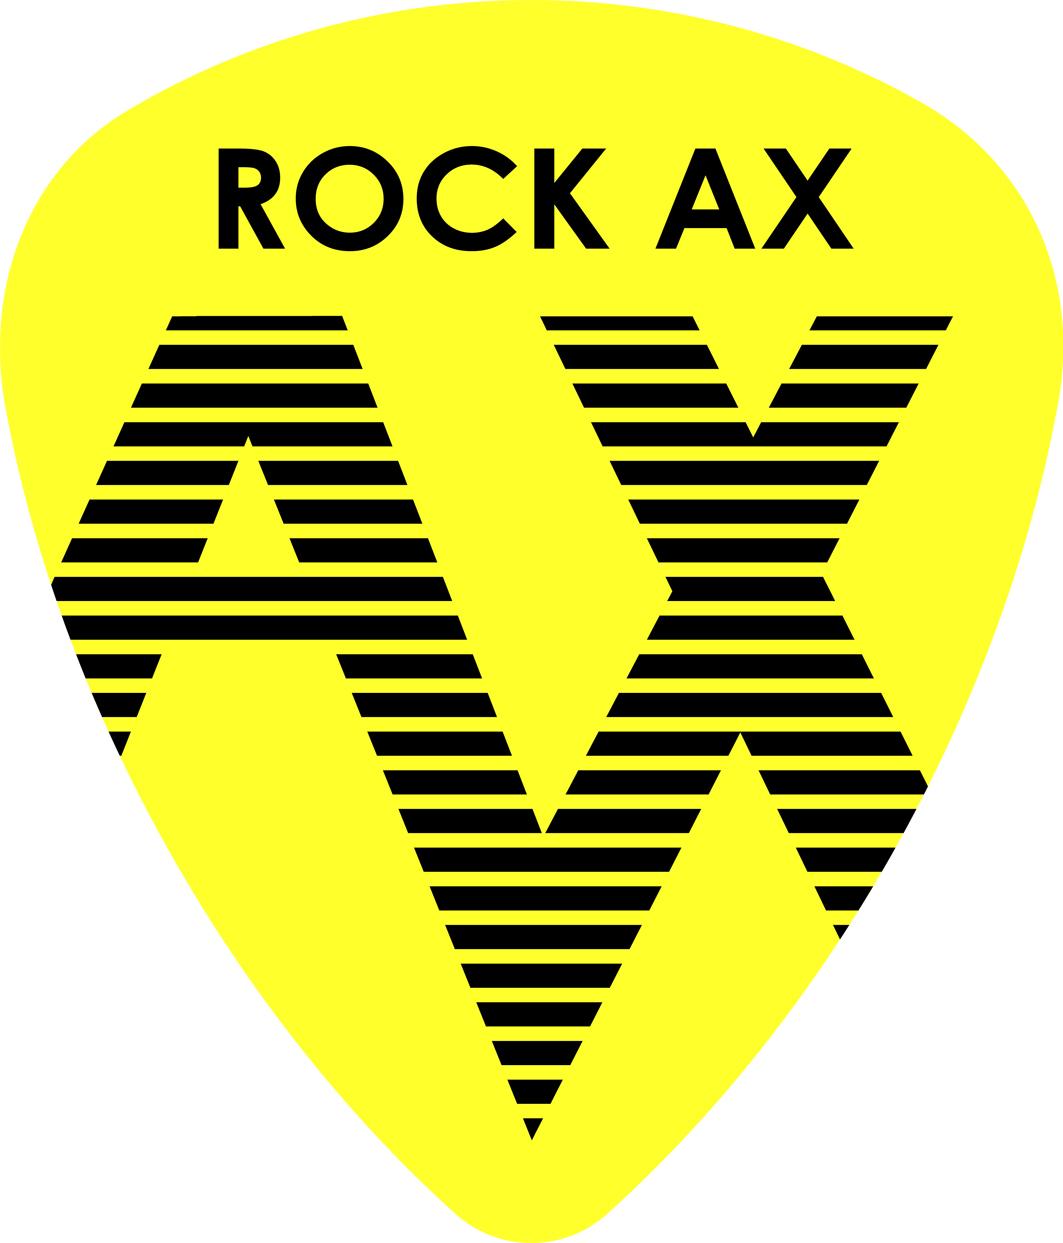 ROCK AX